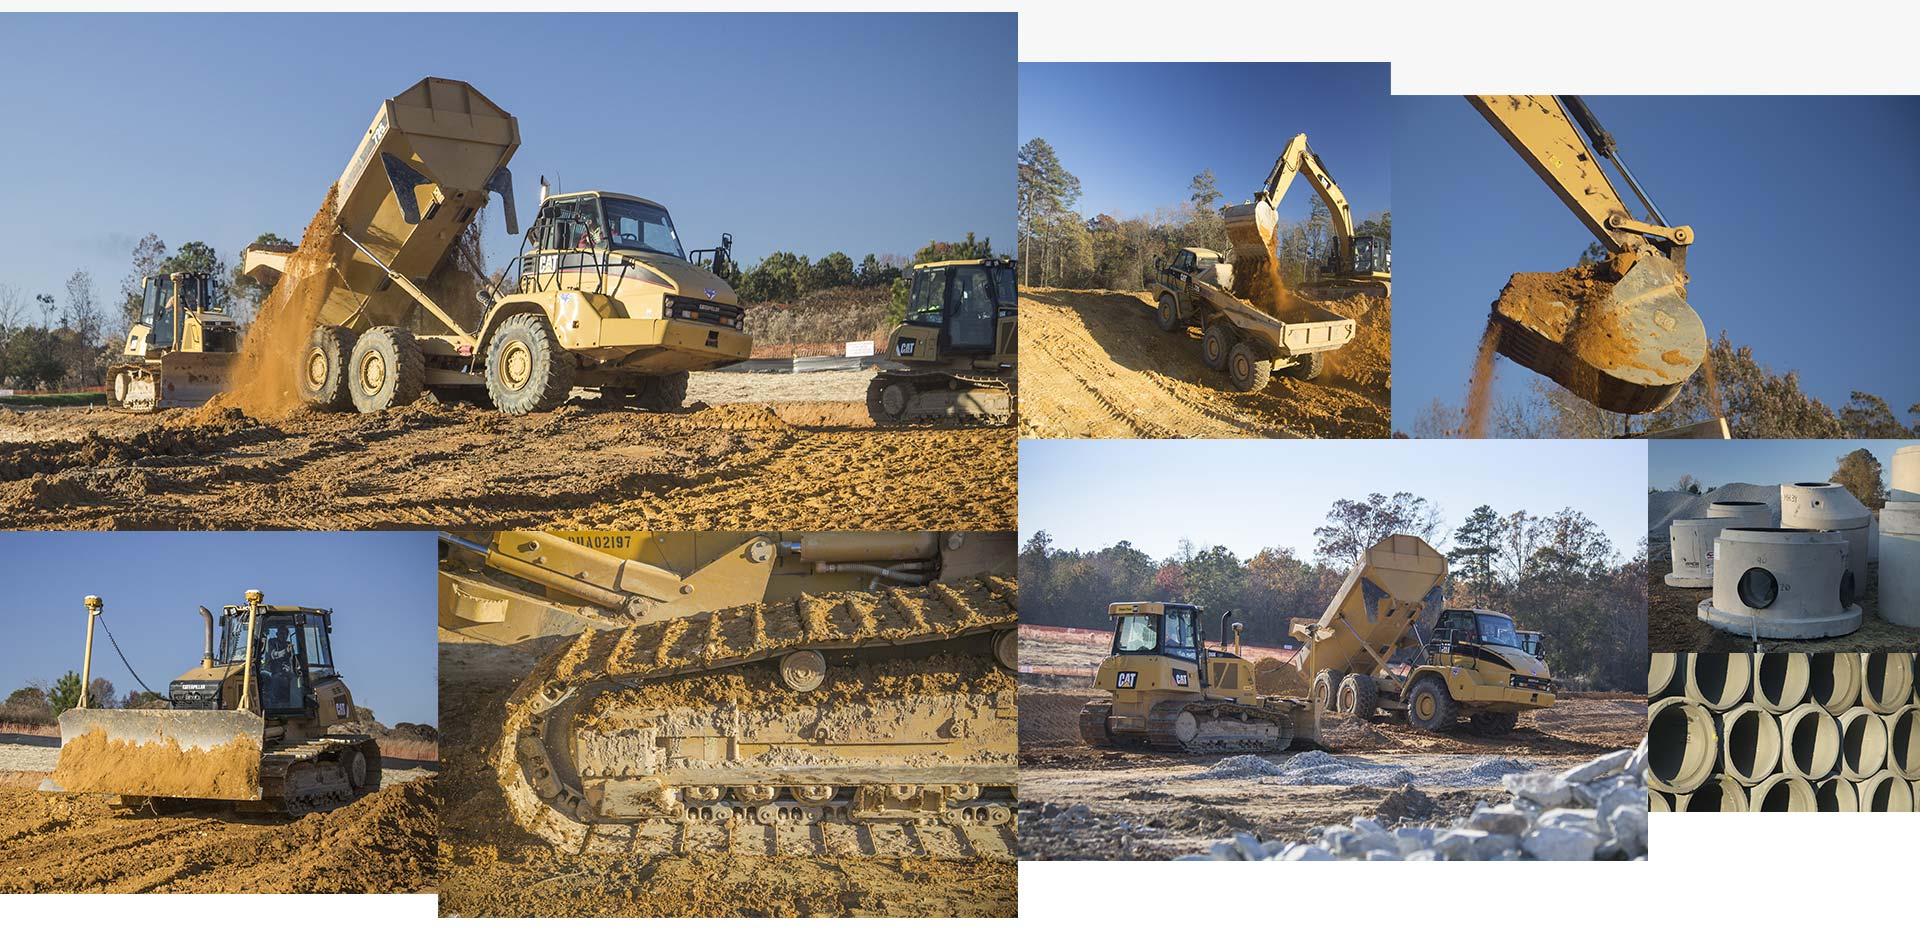 Baxter Johnson Site Contractors - Website Design by Springer Studios, Wilmington, NC